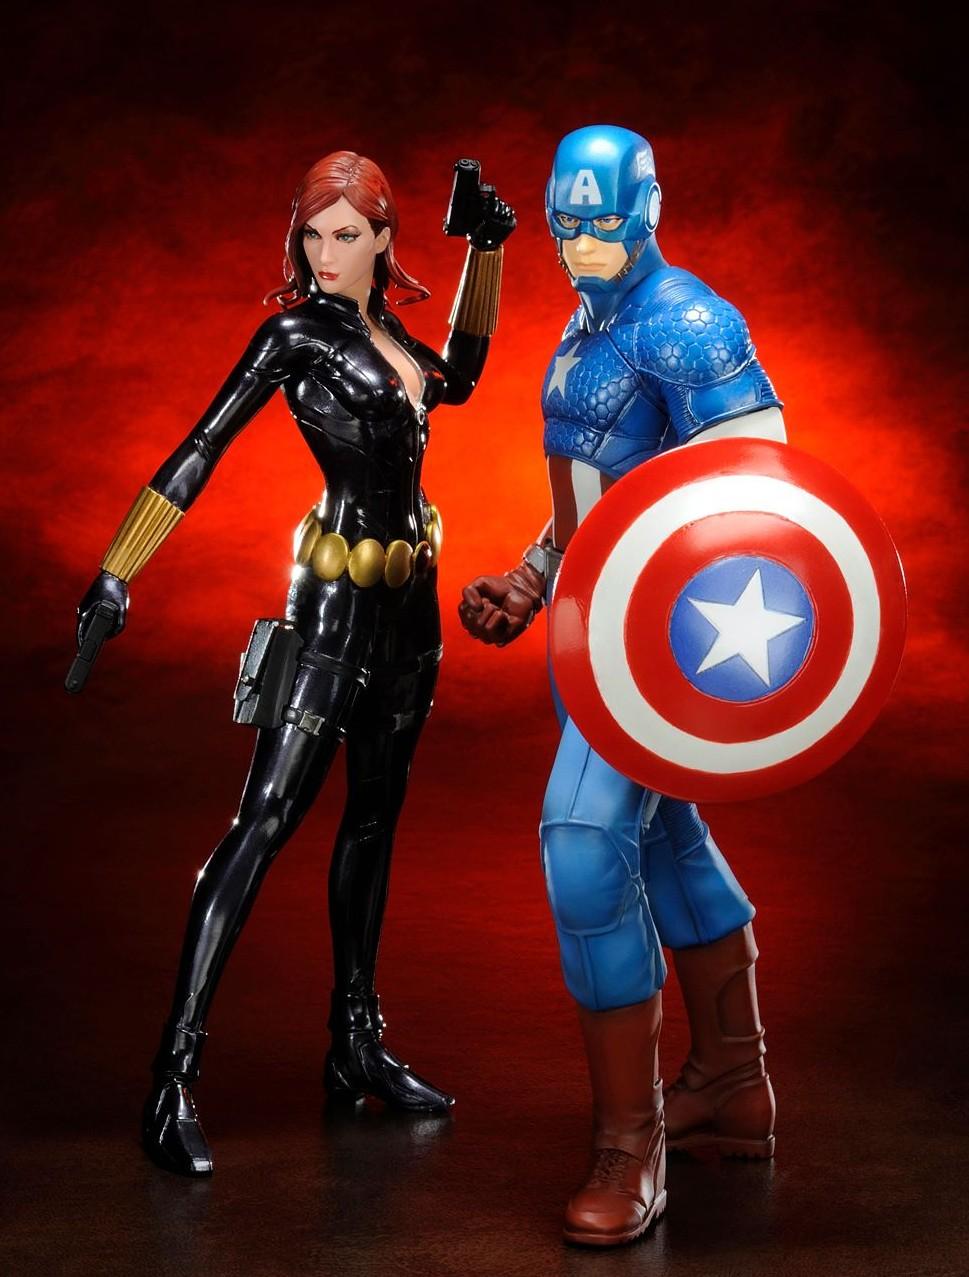 2014 Kotobukiya Avengers Captain America Marvel NOW ArtFX+ Statue